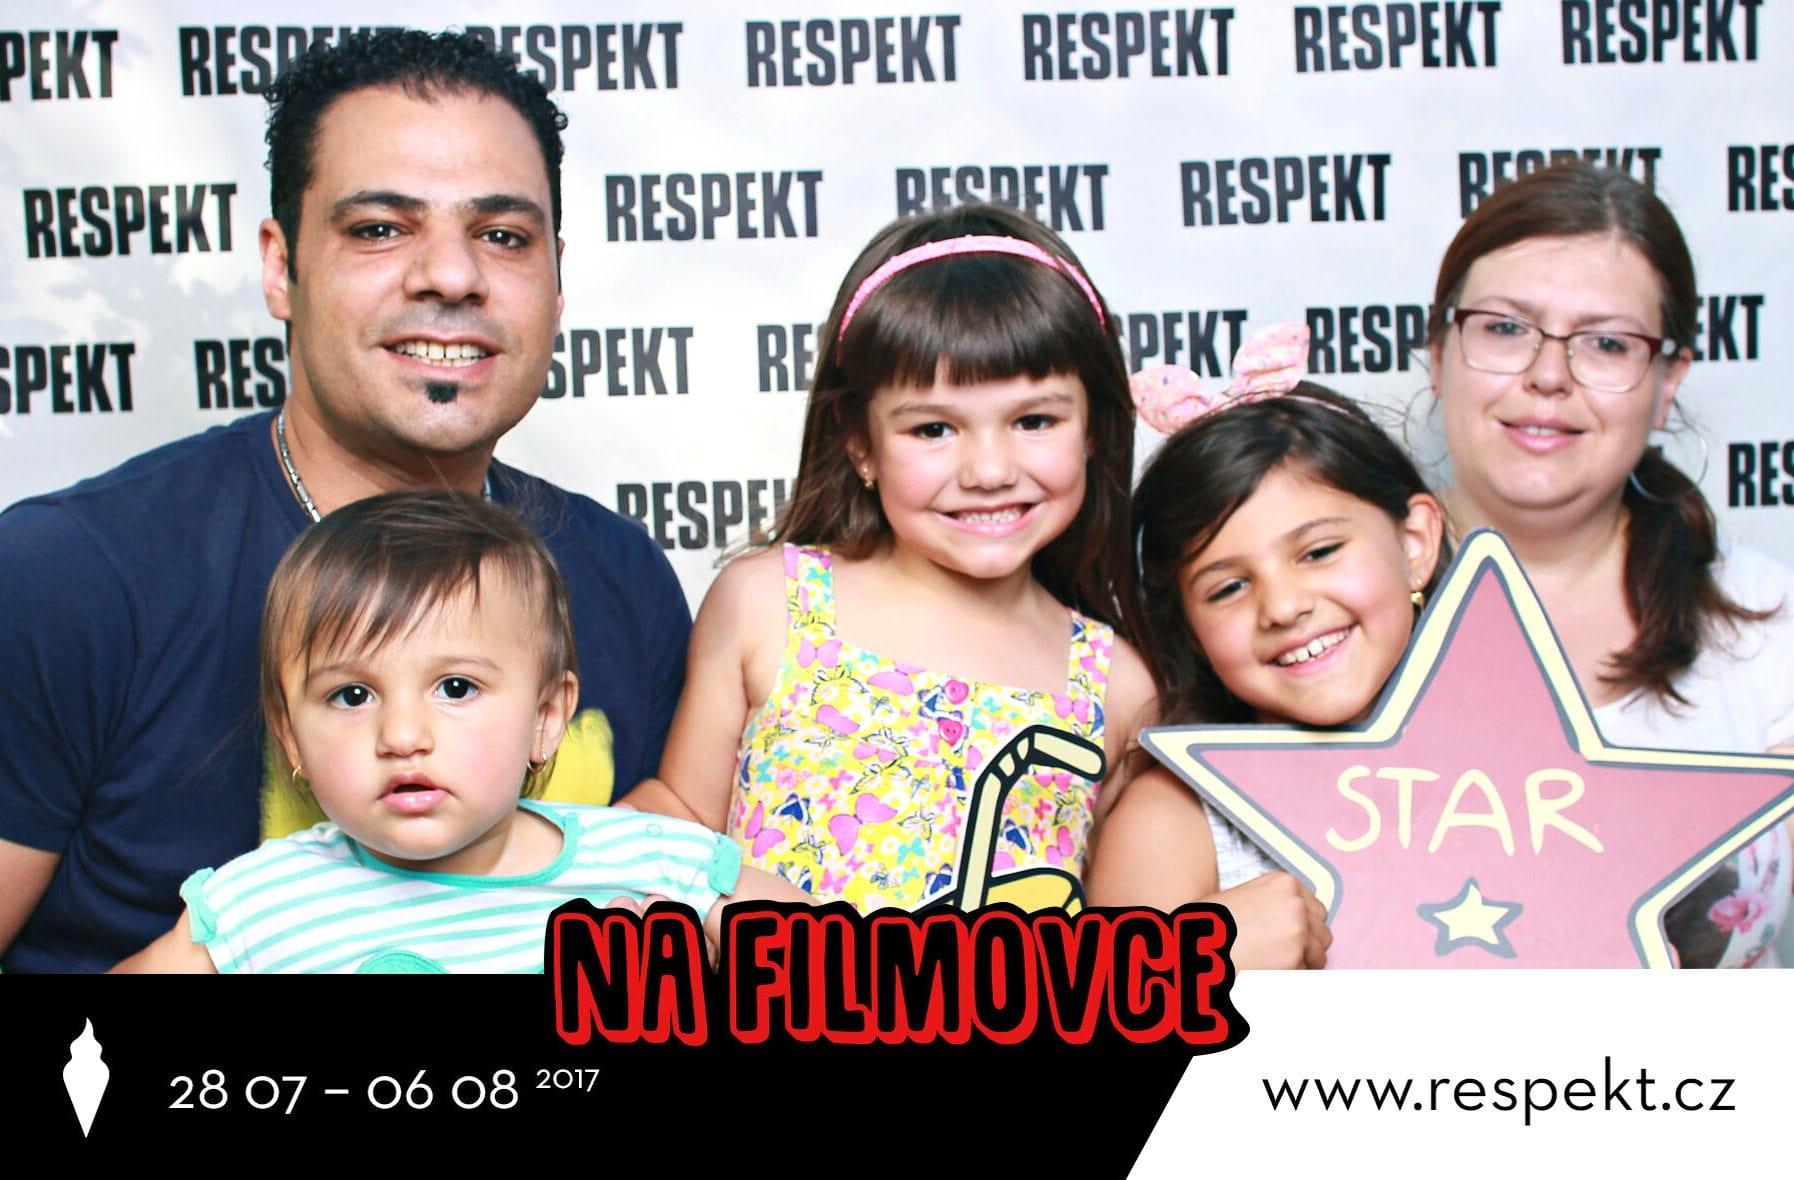 fotokoutek-respekt-na-filmovce-30-7-2017-289883